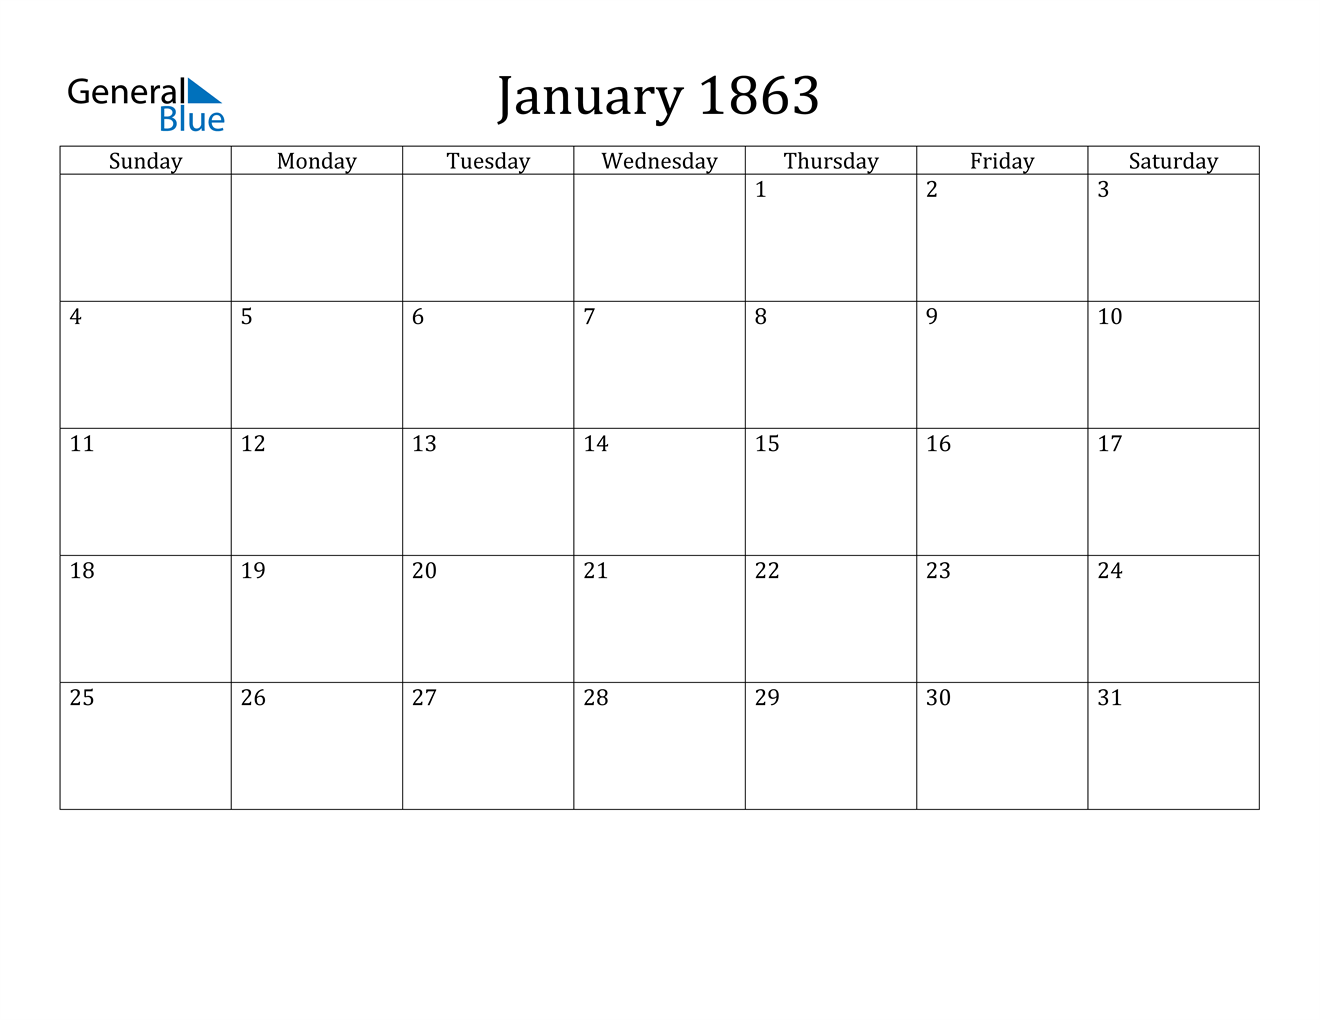 Image of January 1863 Calendar